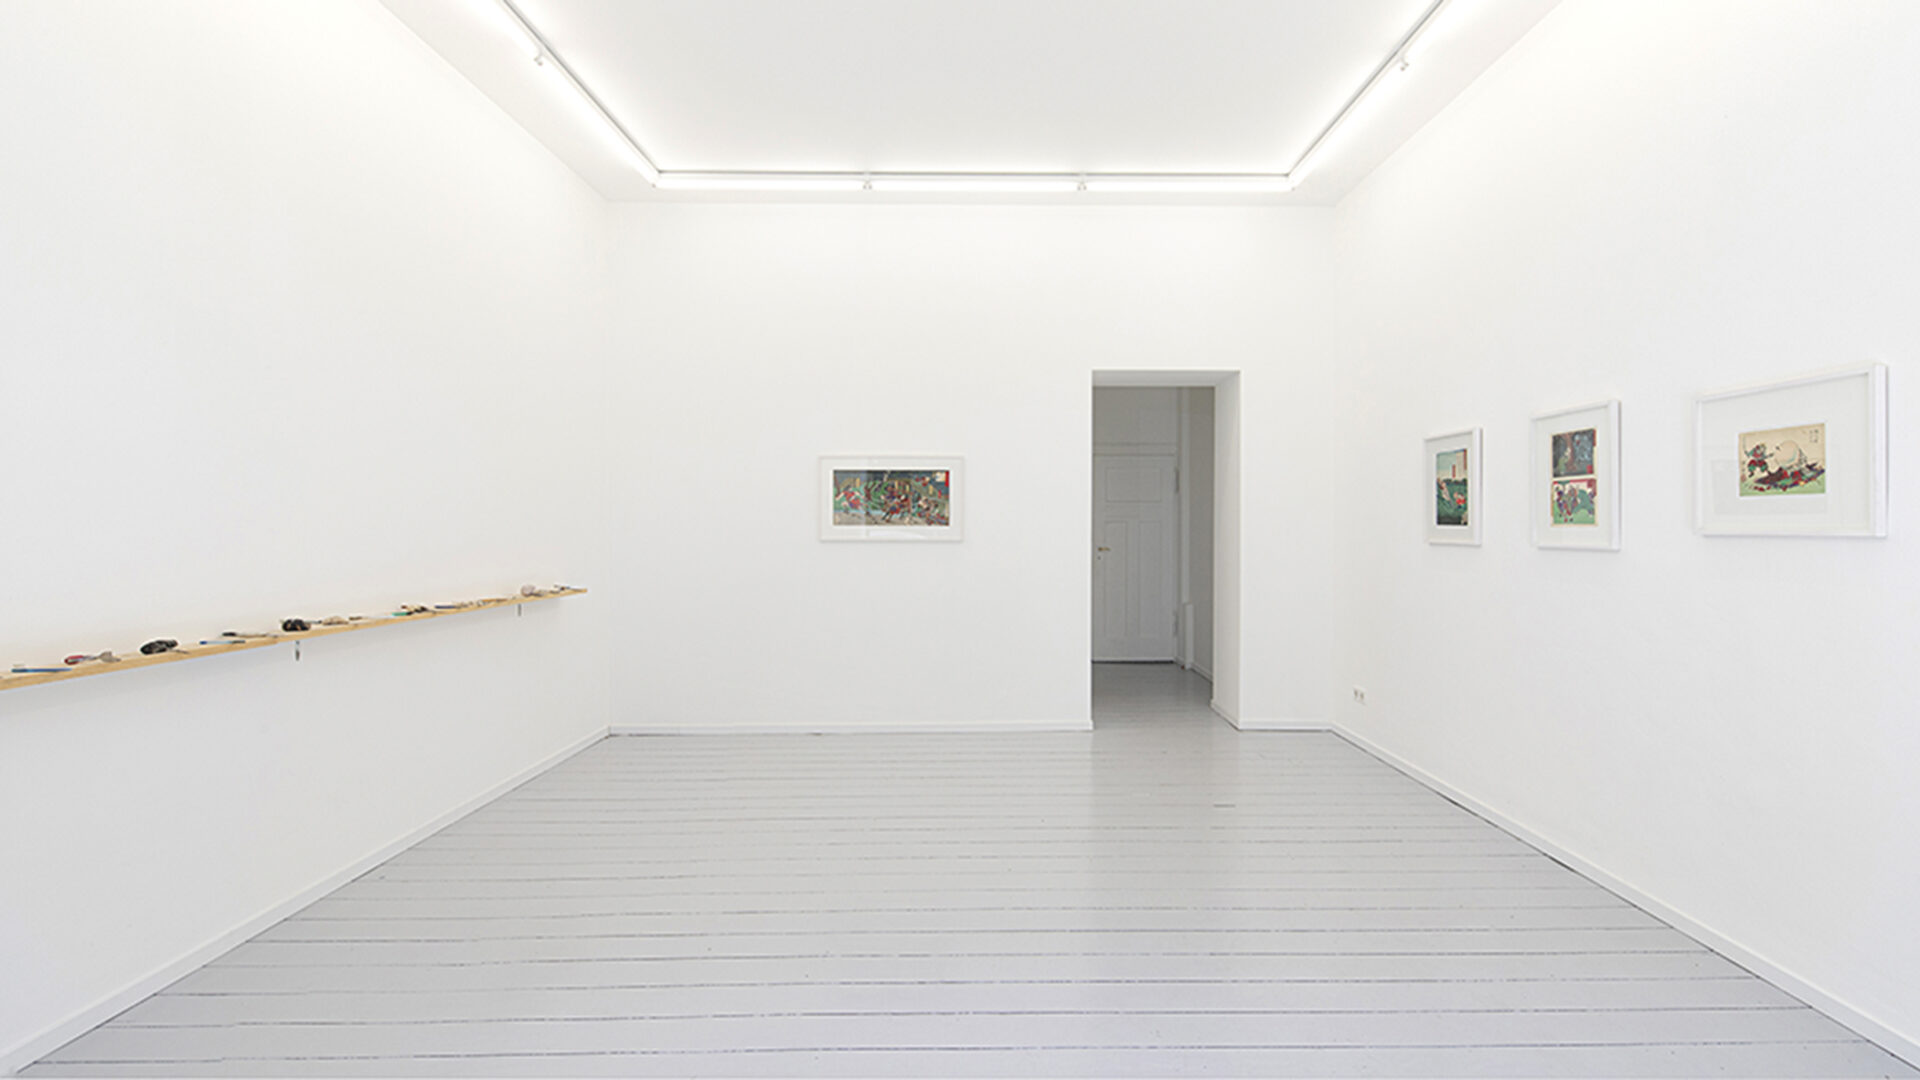 Lee nevo_Yoshitoshi Tsukioka_contemporary sculptur_japanese woodcut prints_basedonart gallery